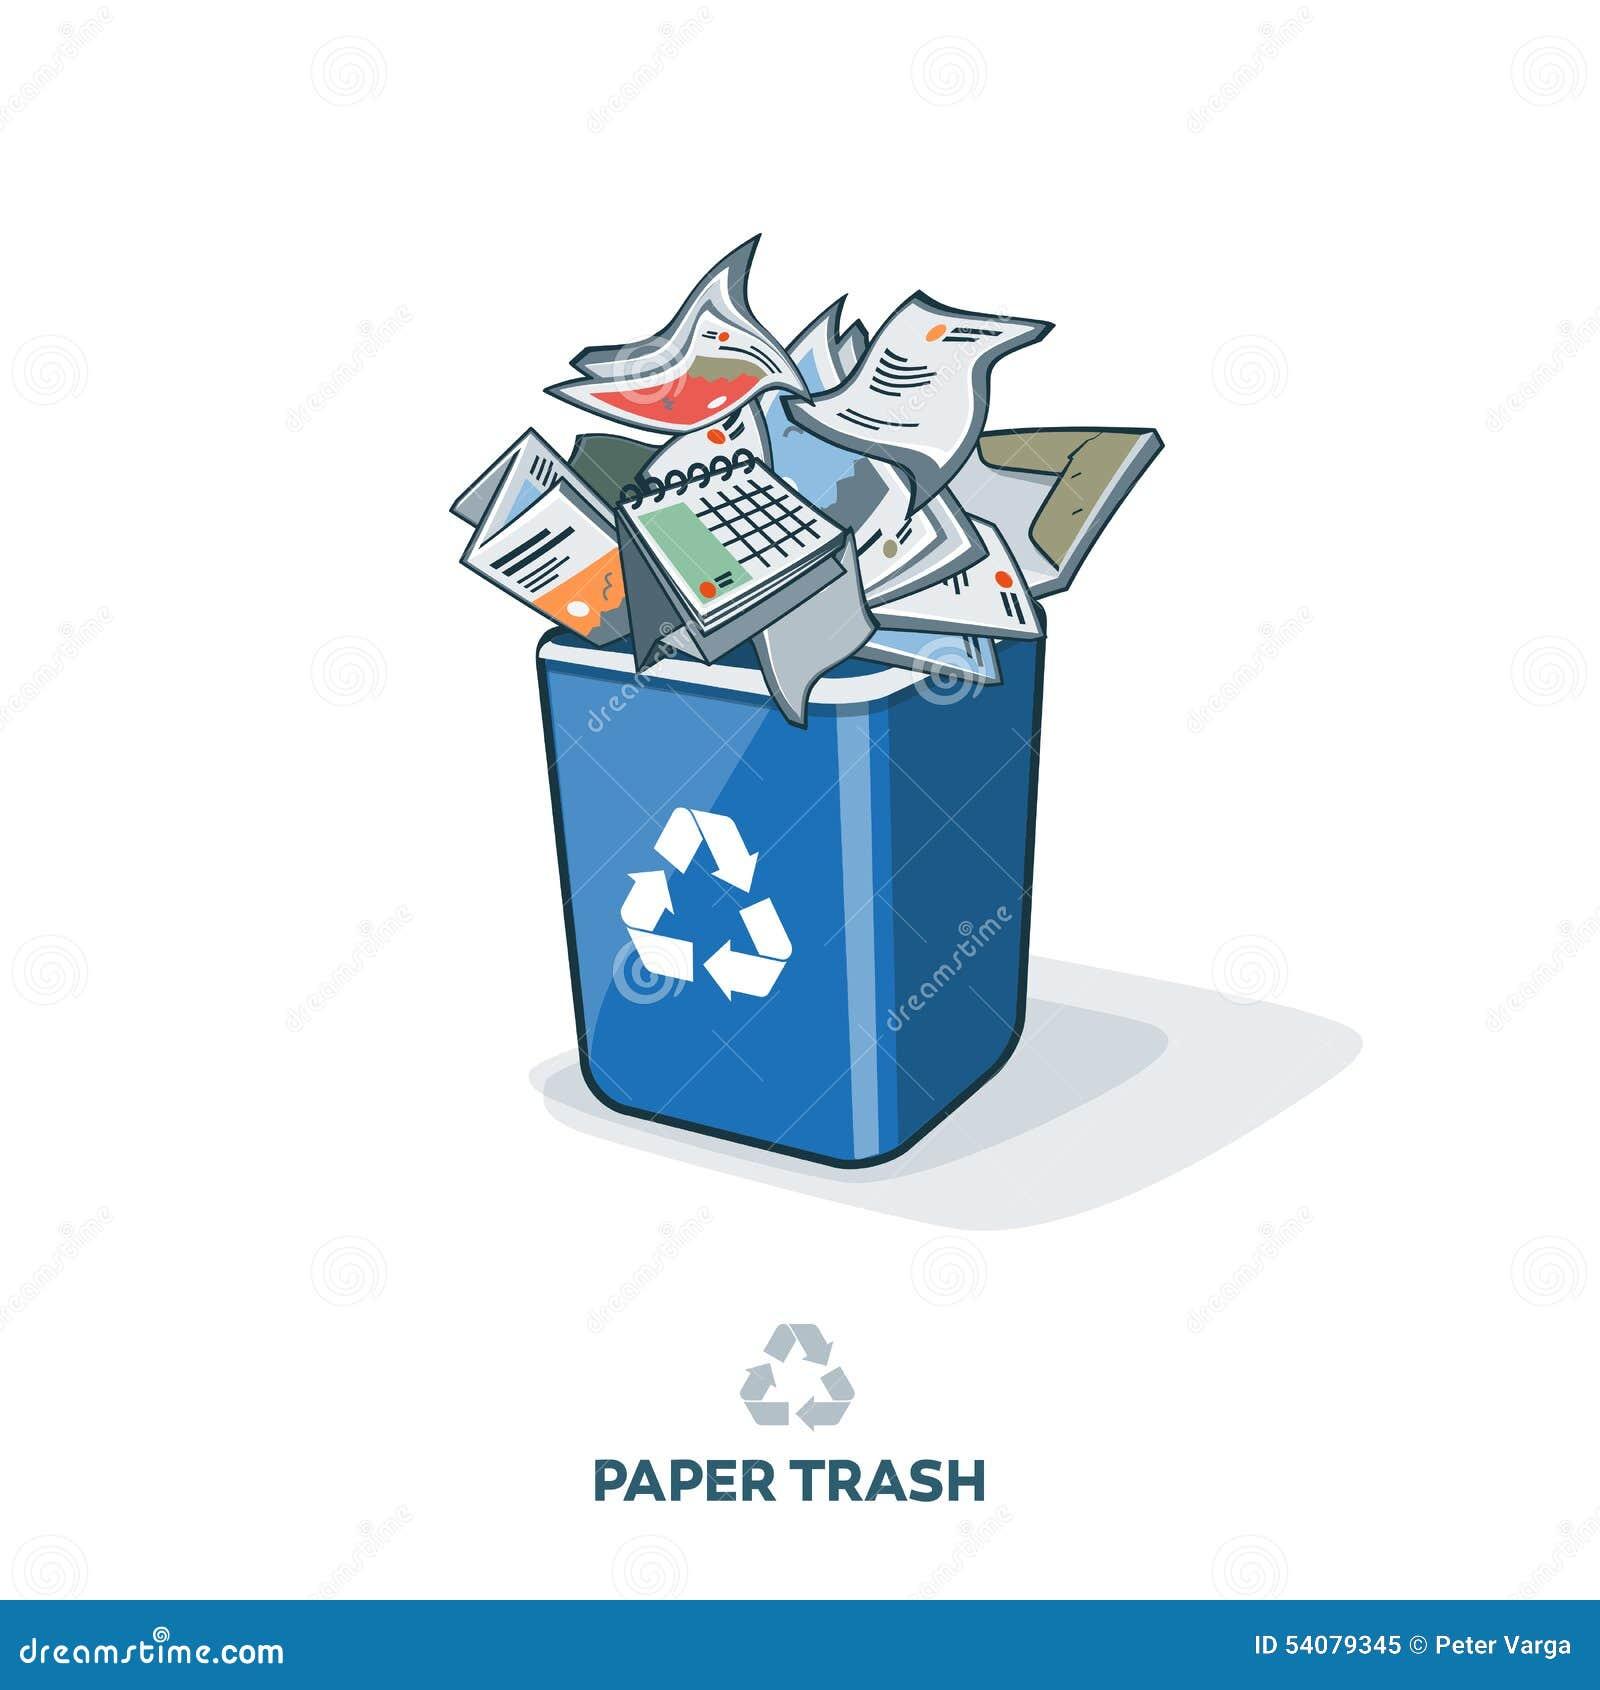 how to draw a recycle bin cartoon